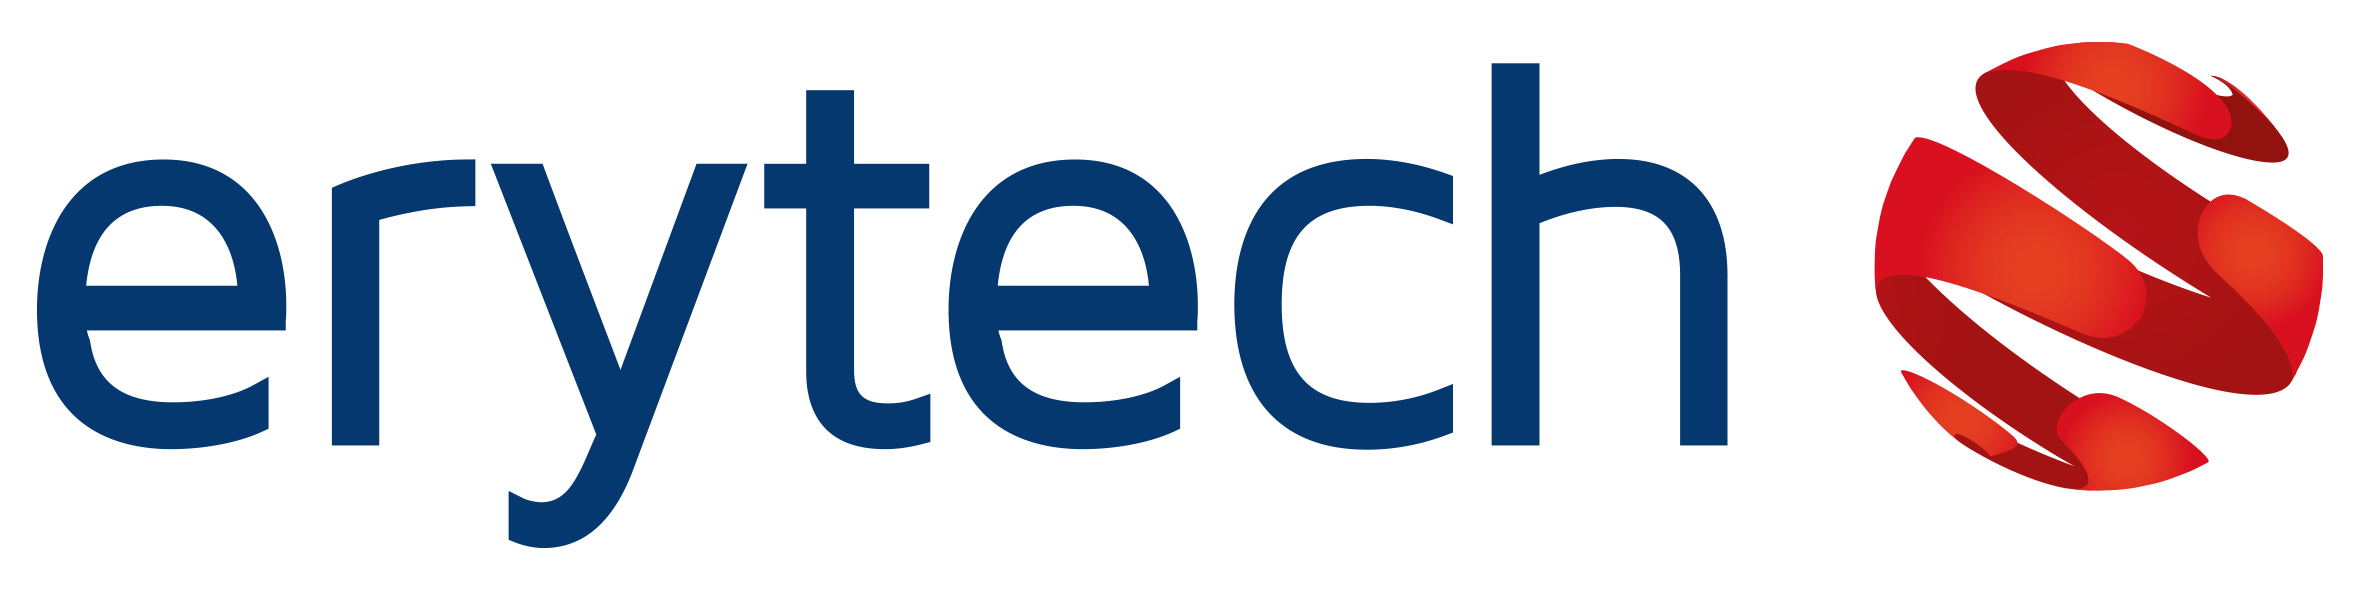 Erytech Pharma Company Profile Owler